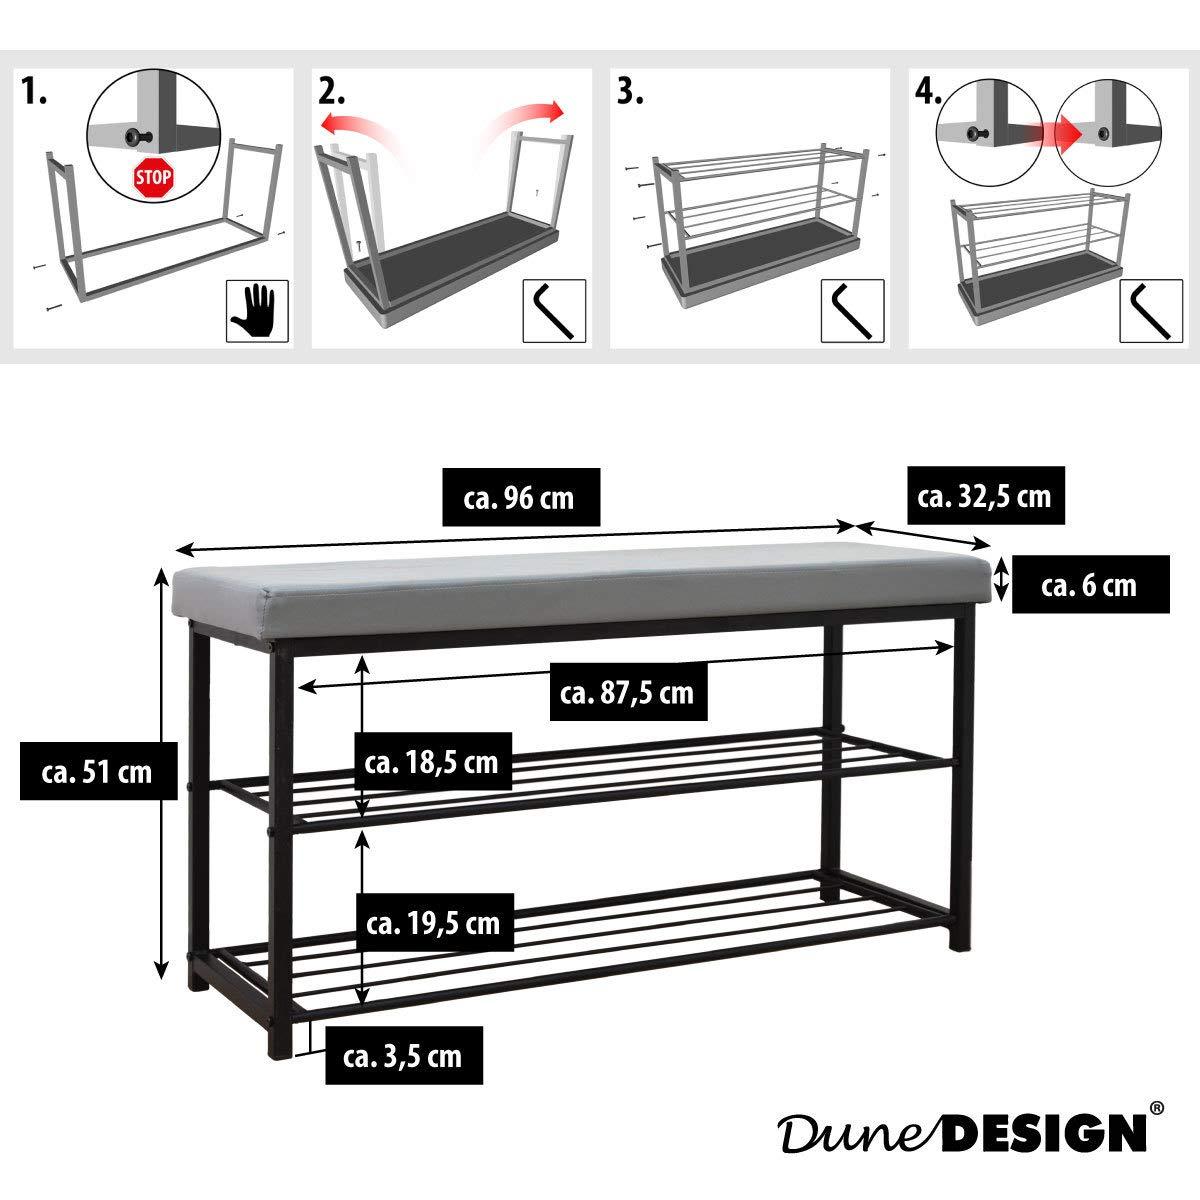 DuneDesign Schuhregal 96x32,5x51cm Schuhbank Offener Schuhschrank Sitzbank Grau